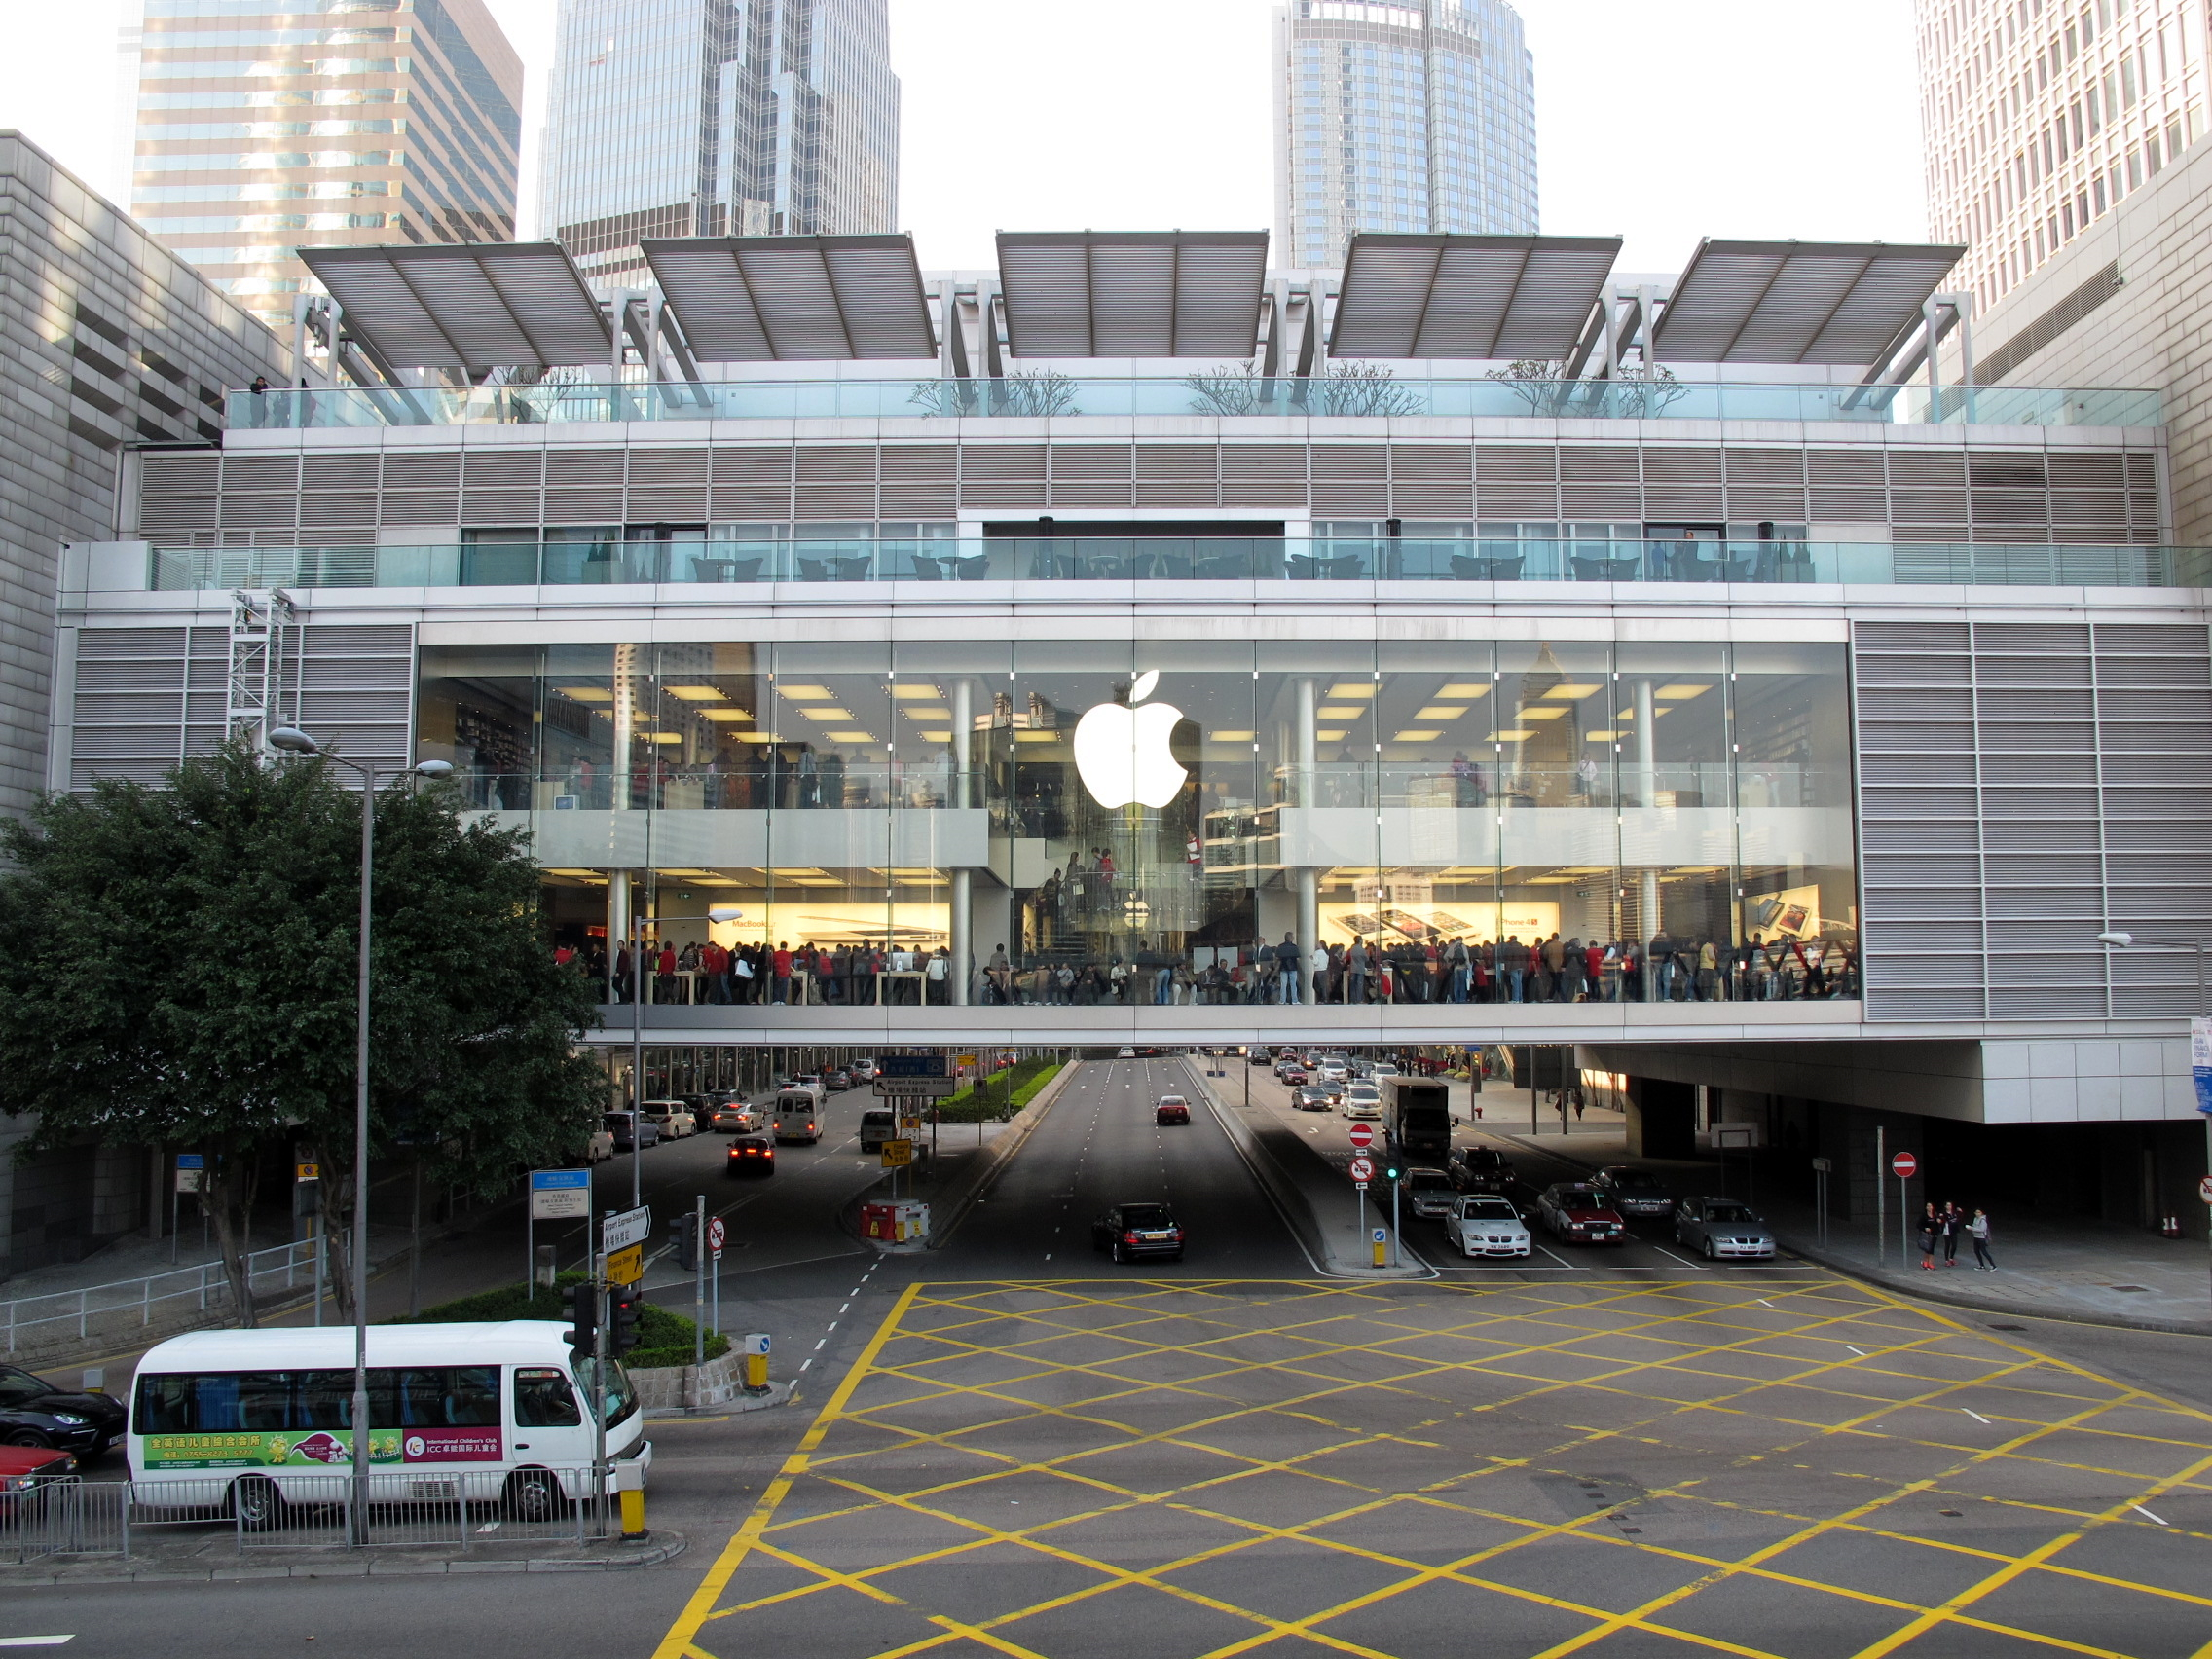 File:HK ifc Apple Store Outside View 201112.jpg - 維基百科,自由的百科全書